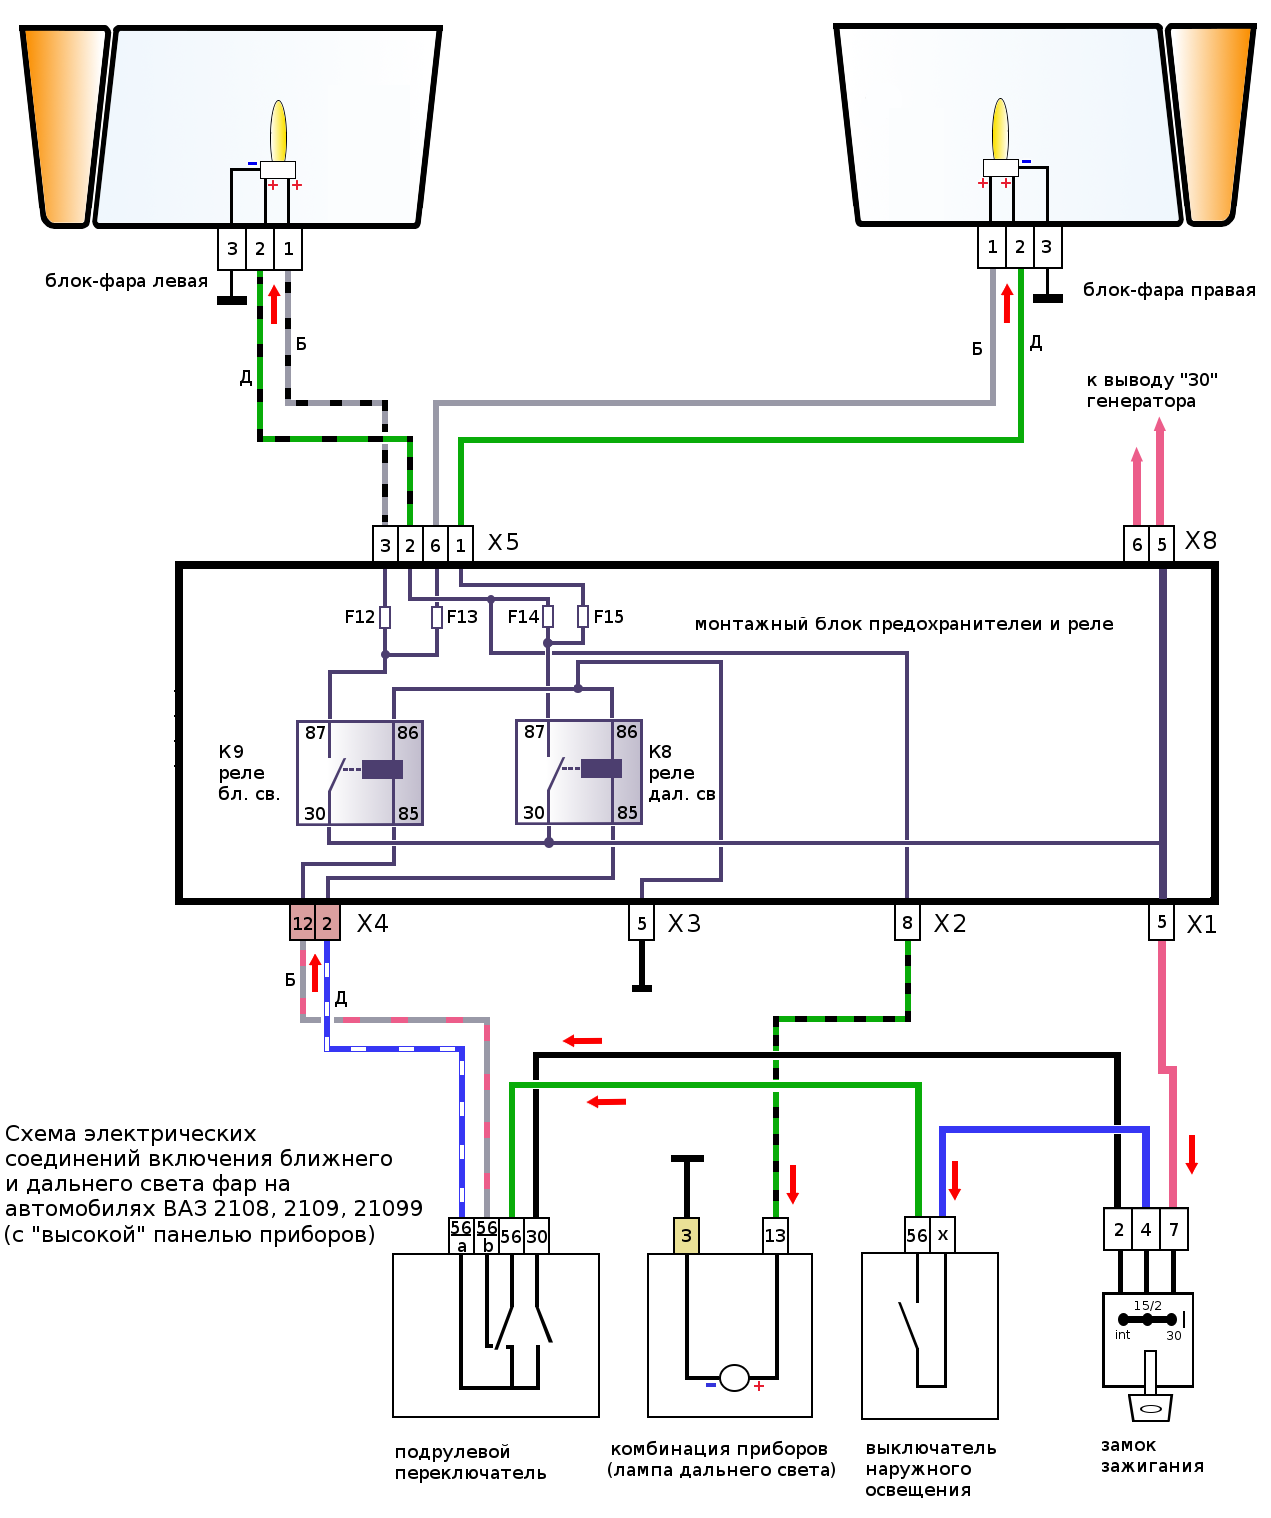 Ваз 2108 вентилятор радиатора схема подключения6